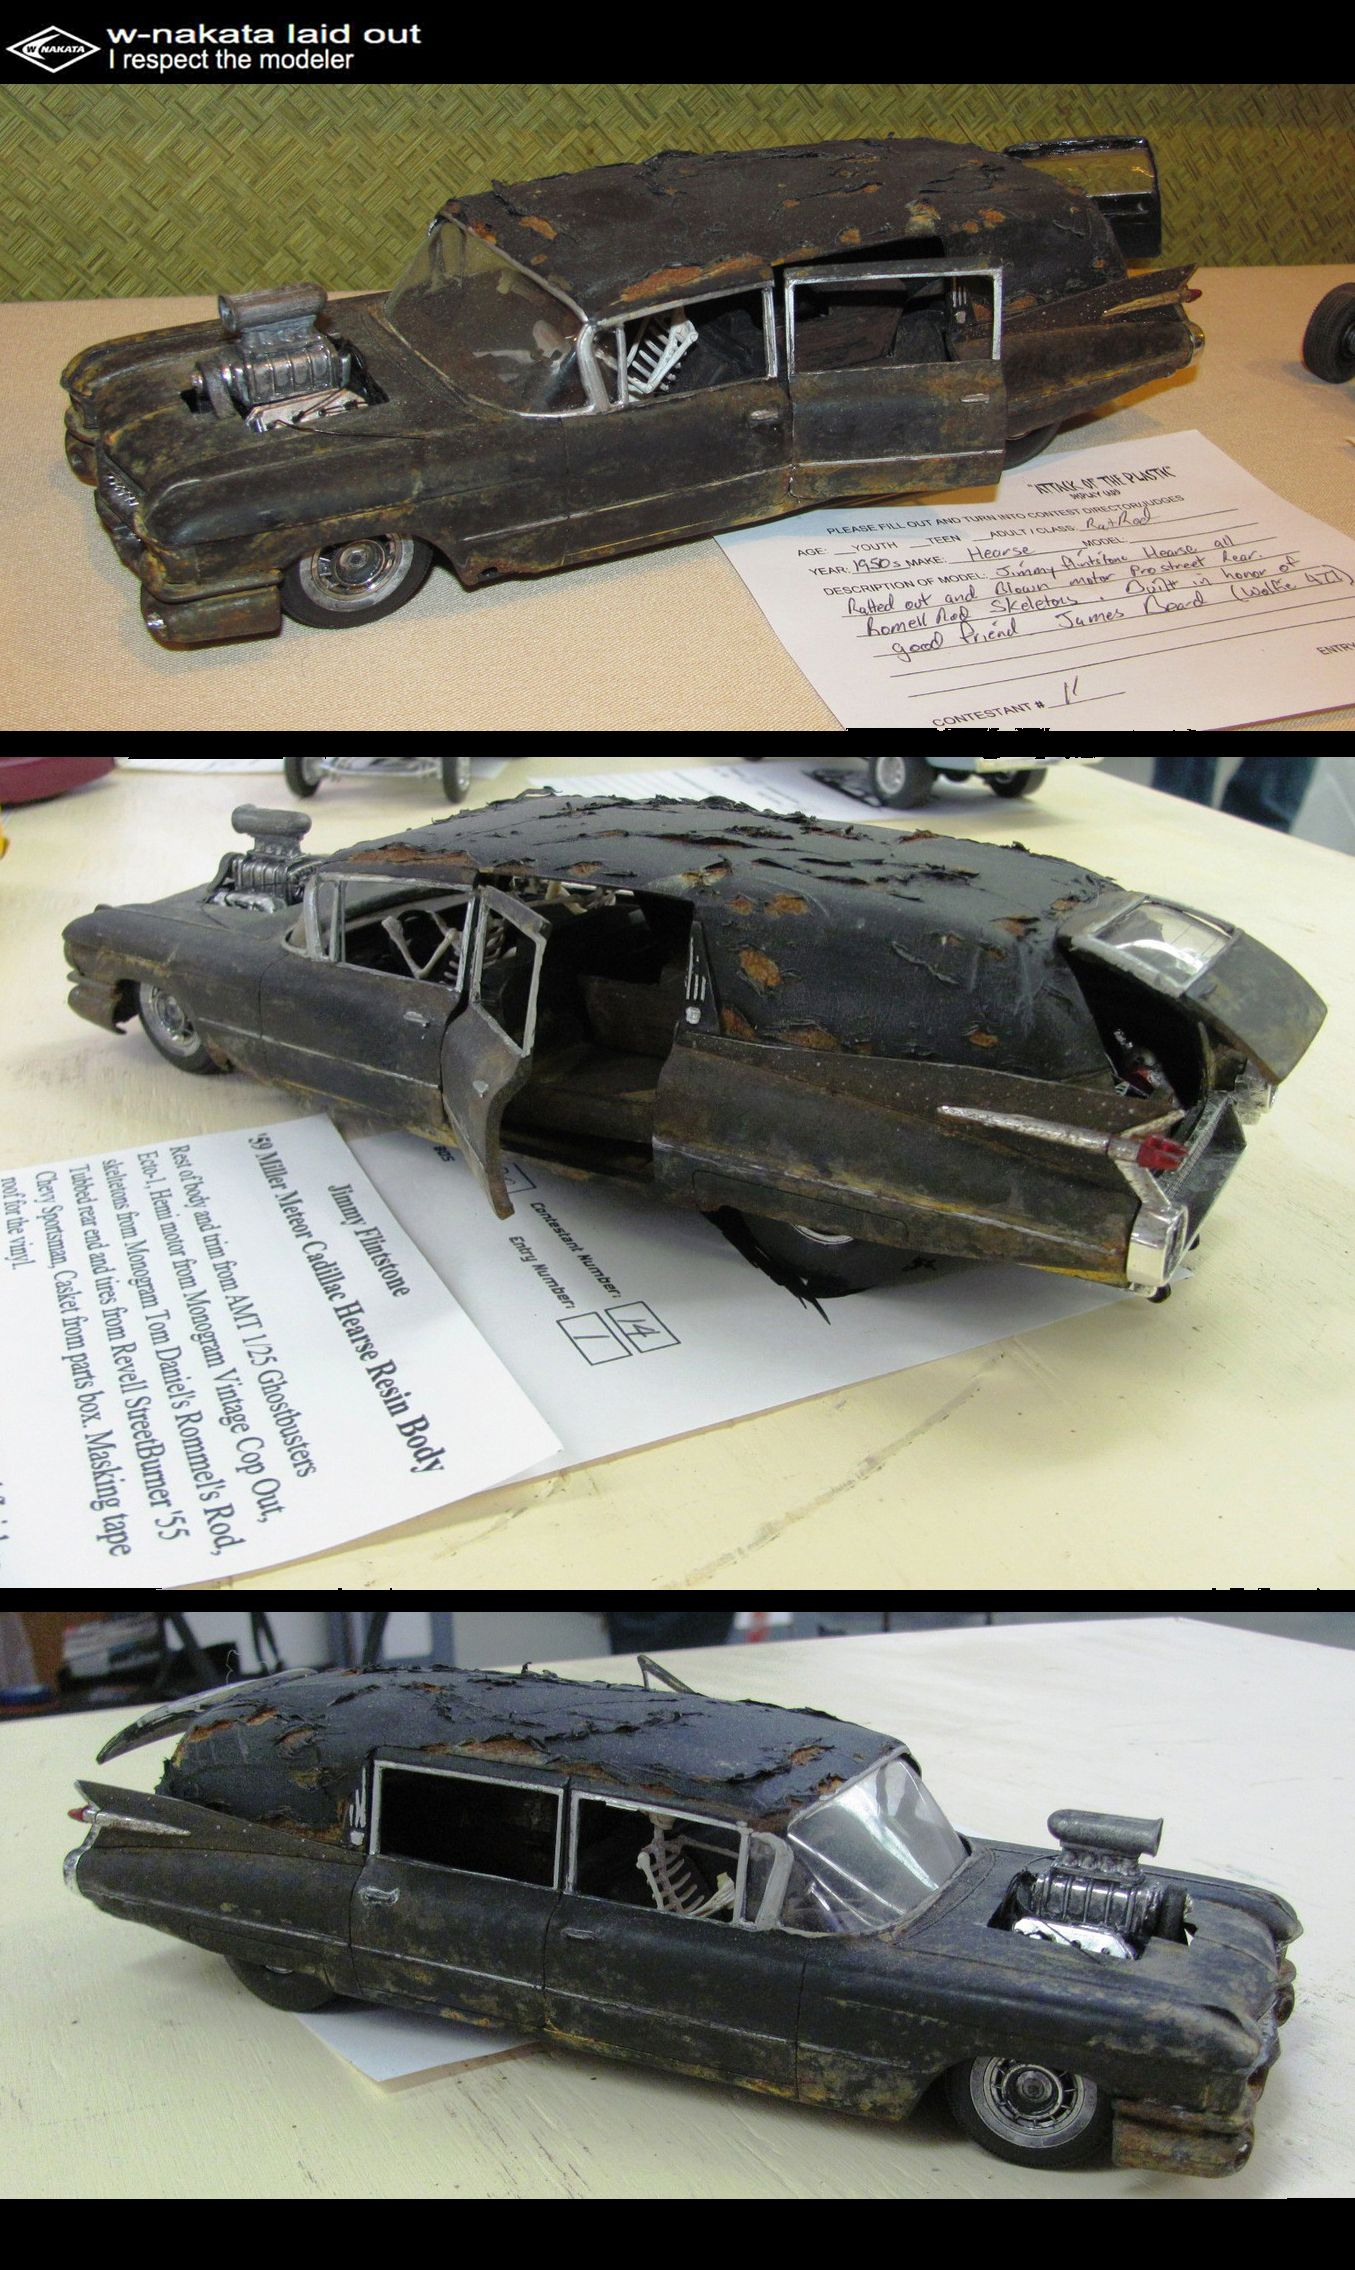 Pin by Brian Holub on kits | Plastic model cars, Model cars kits